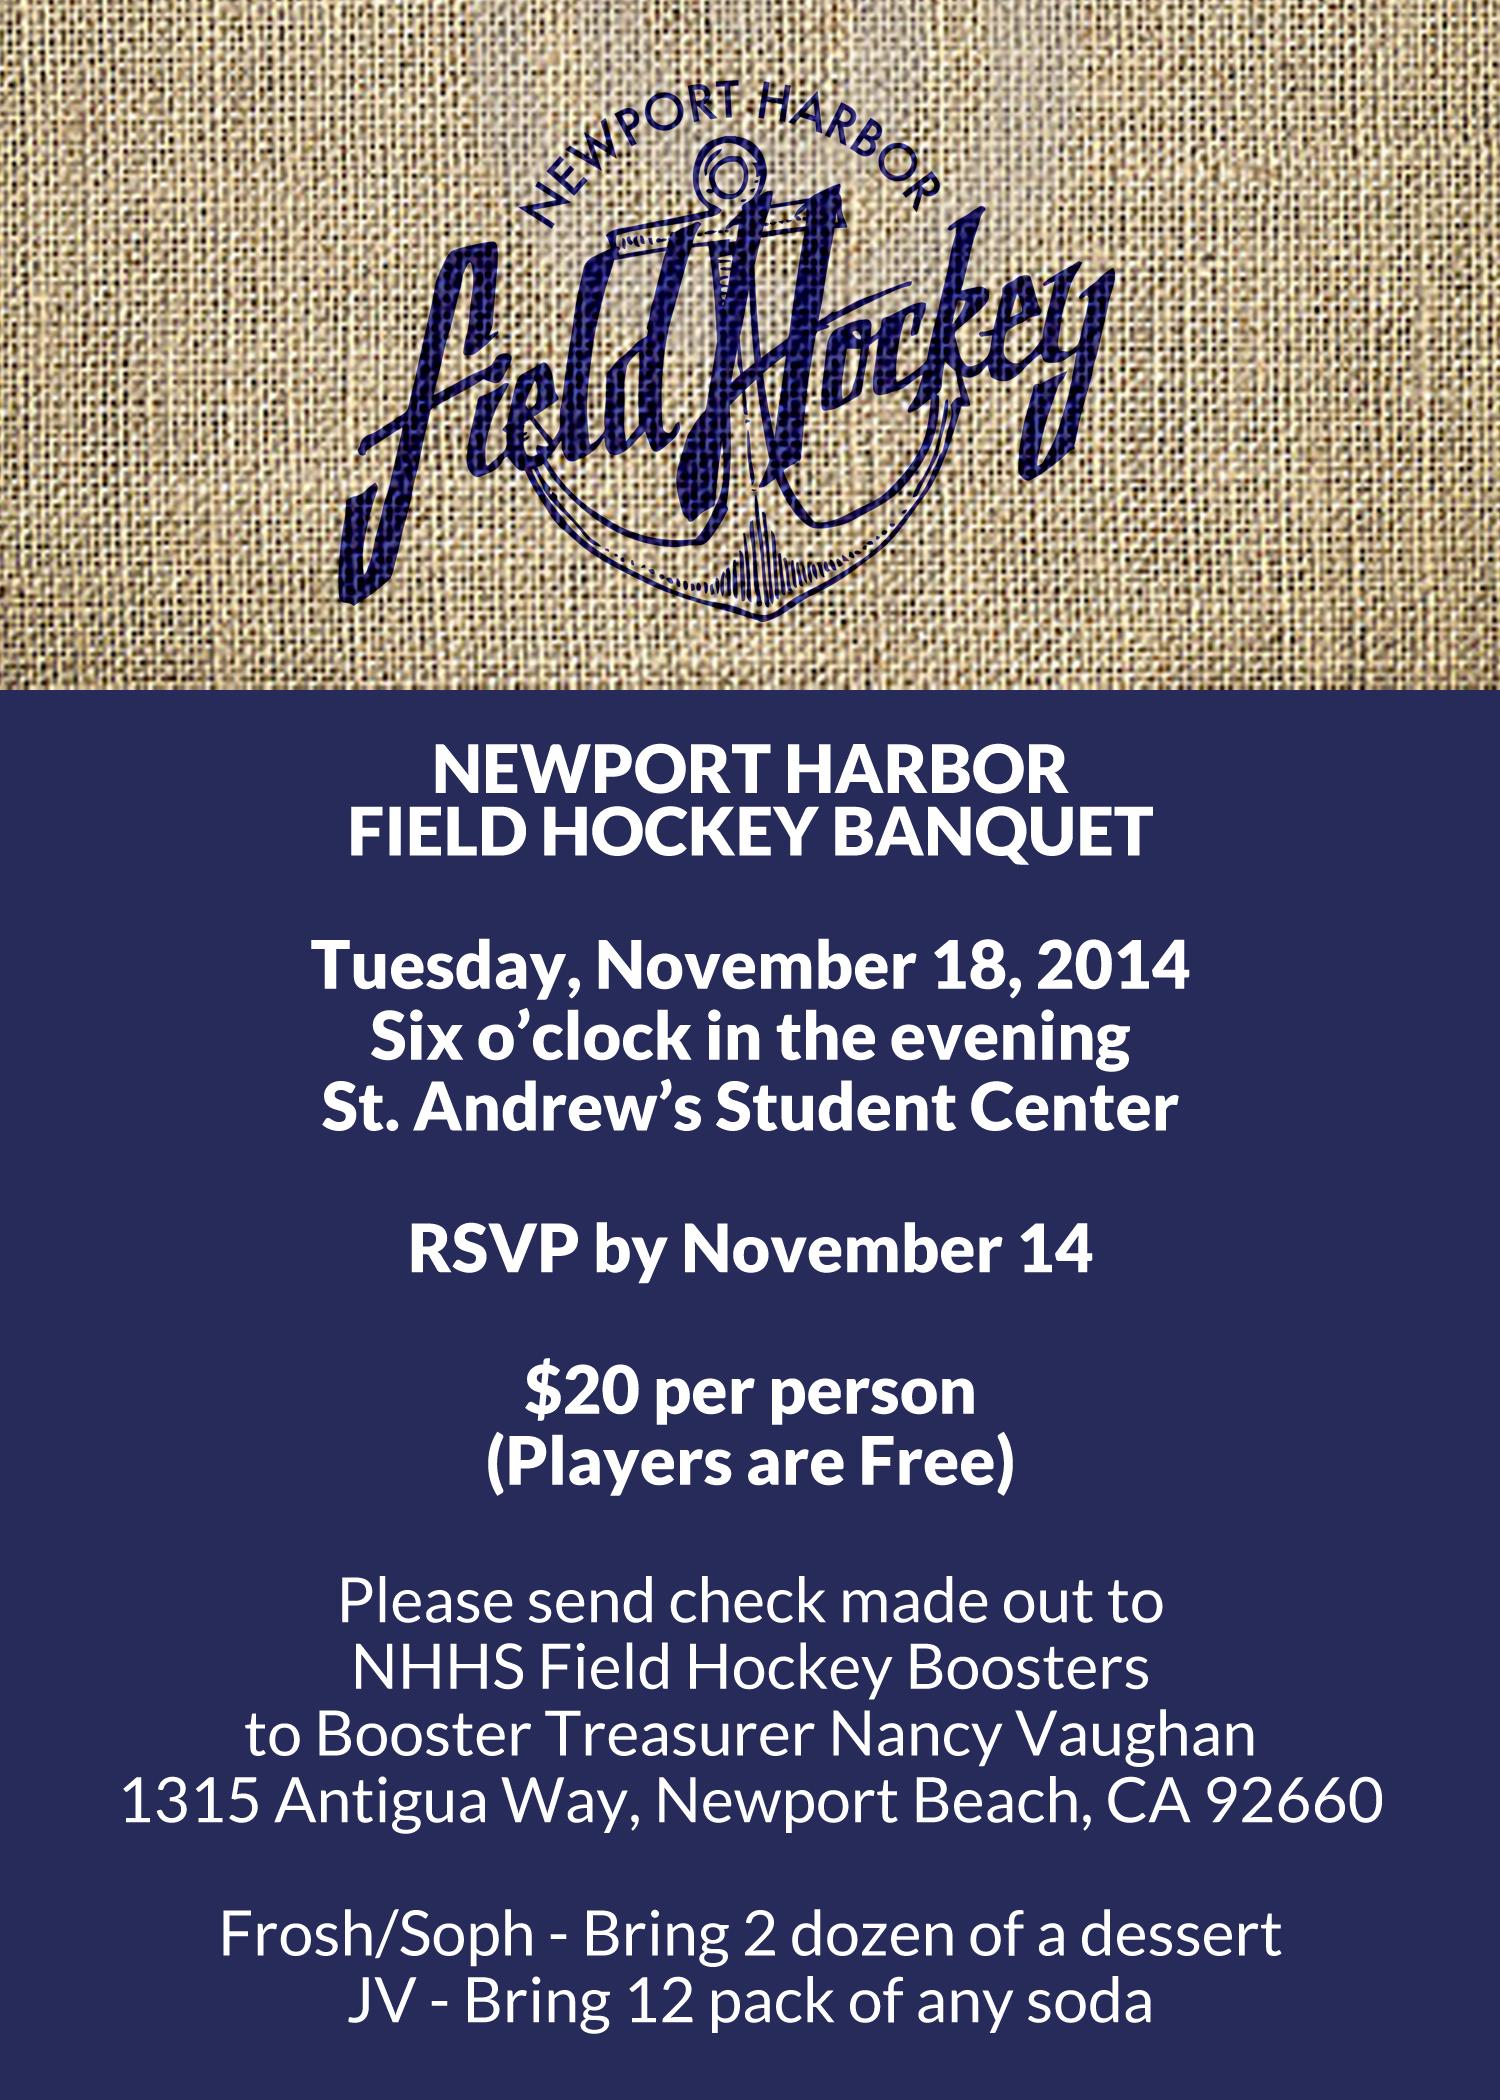 newport harbor field hockey